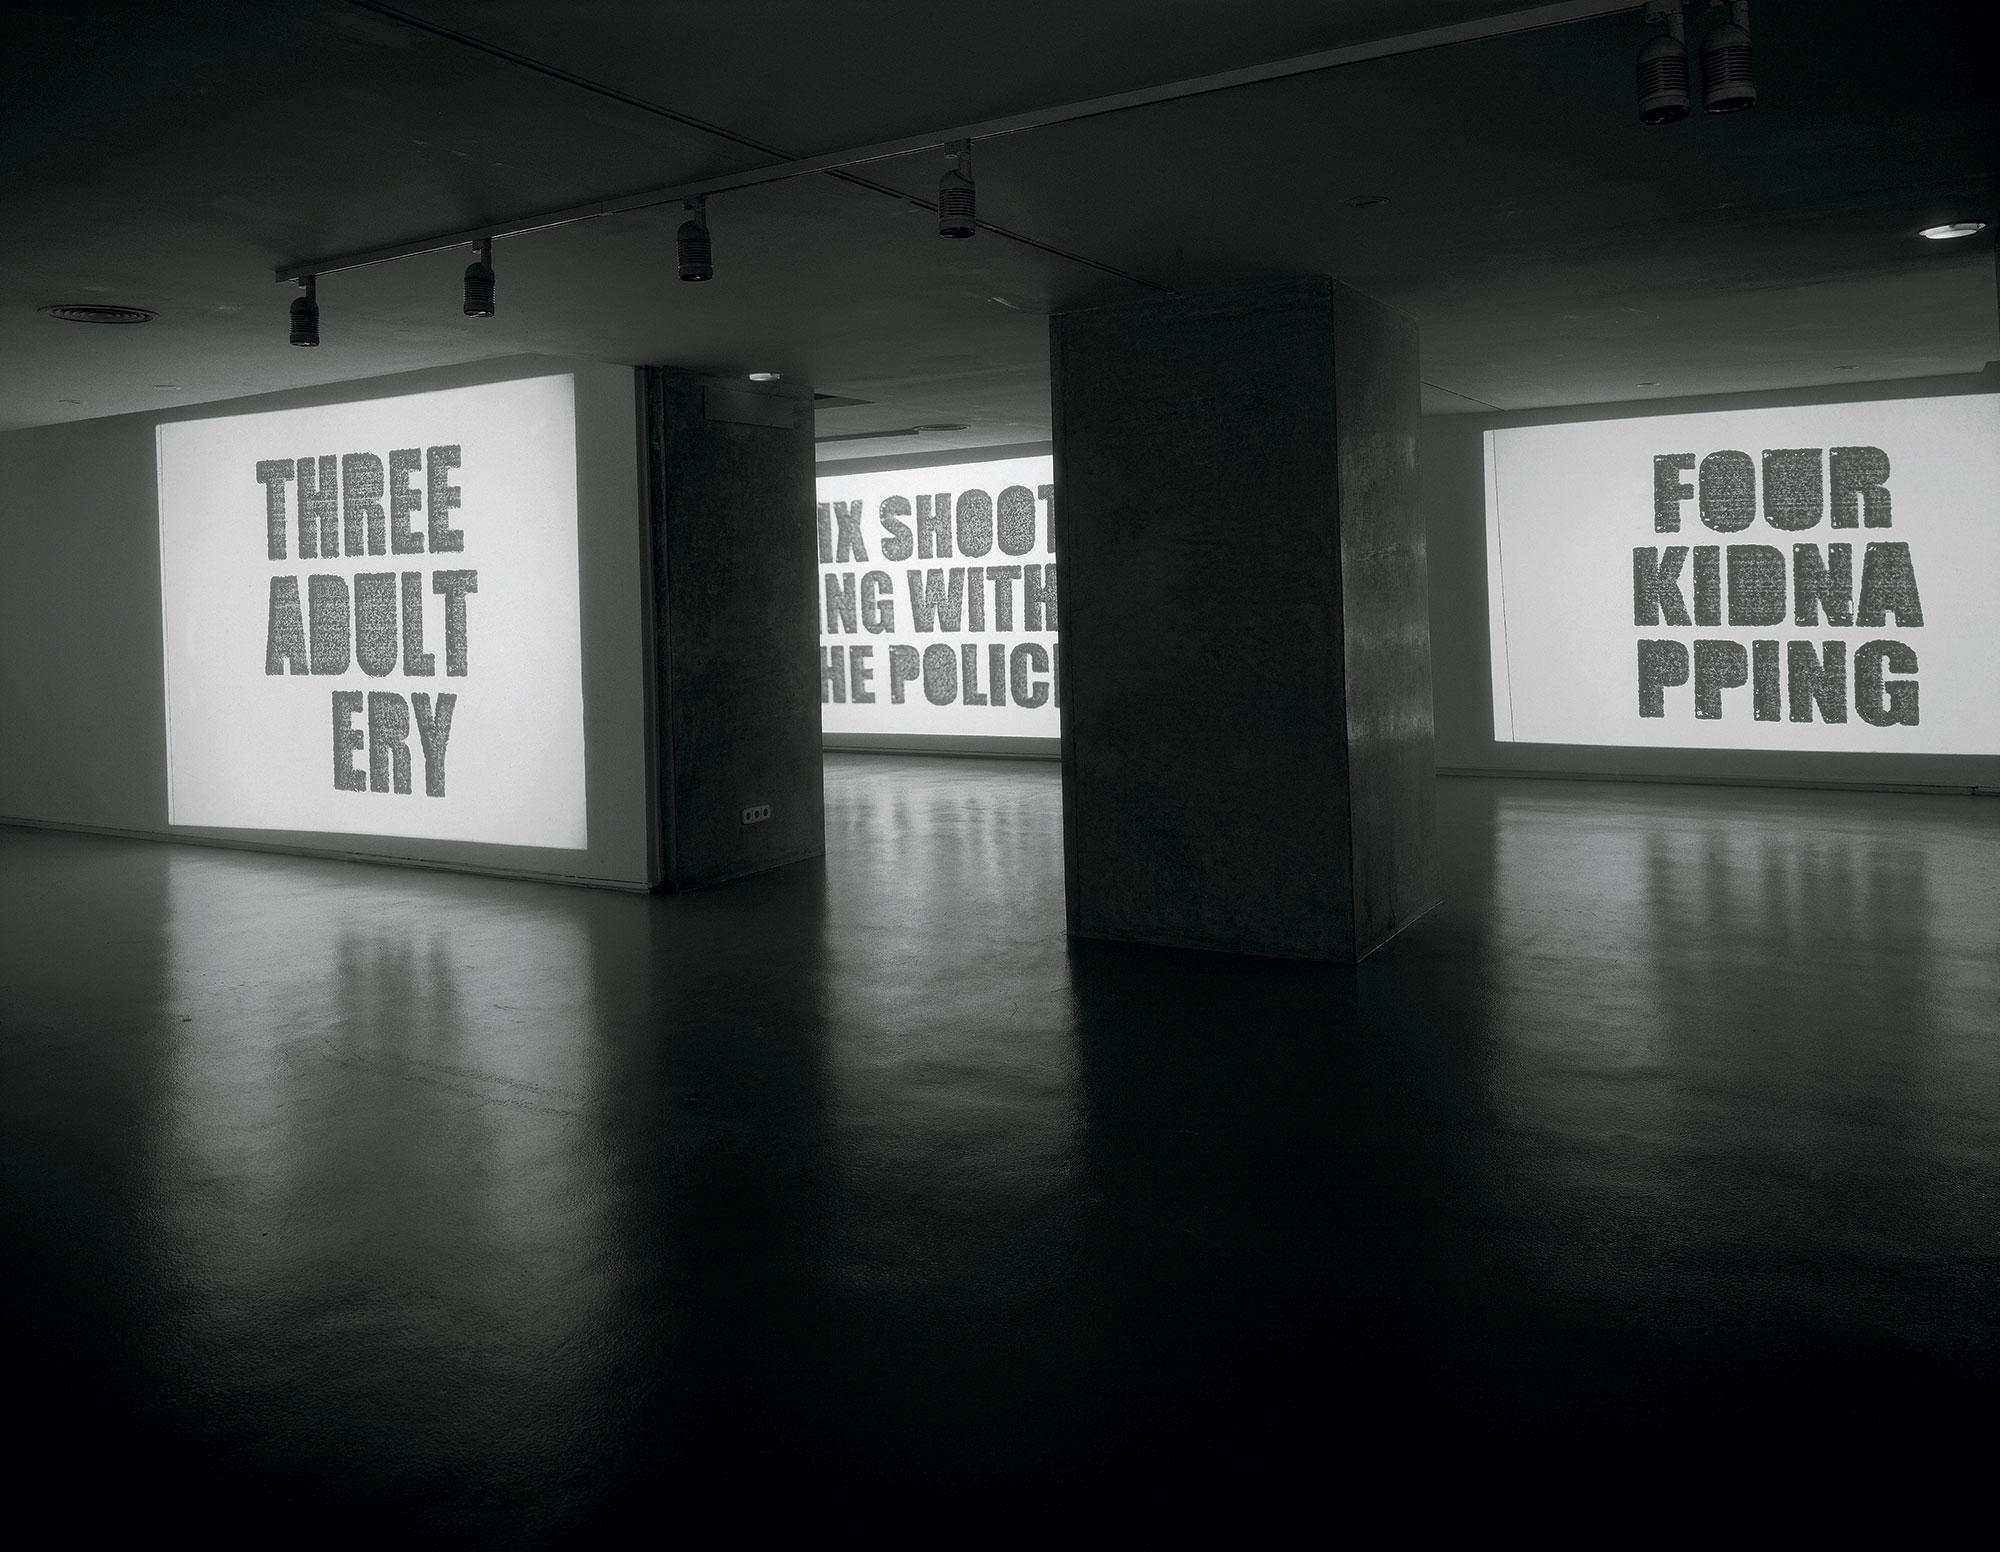 Jon Mikel Euba (2003) - Kill'em all+Fiesta 4 Puertas